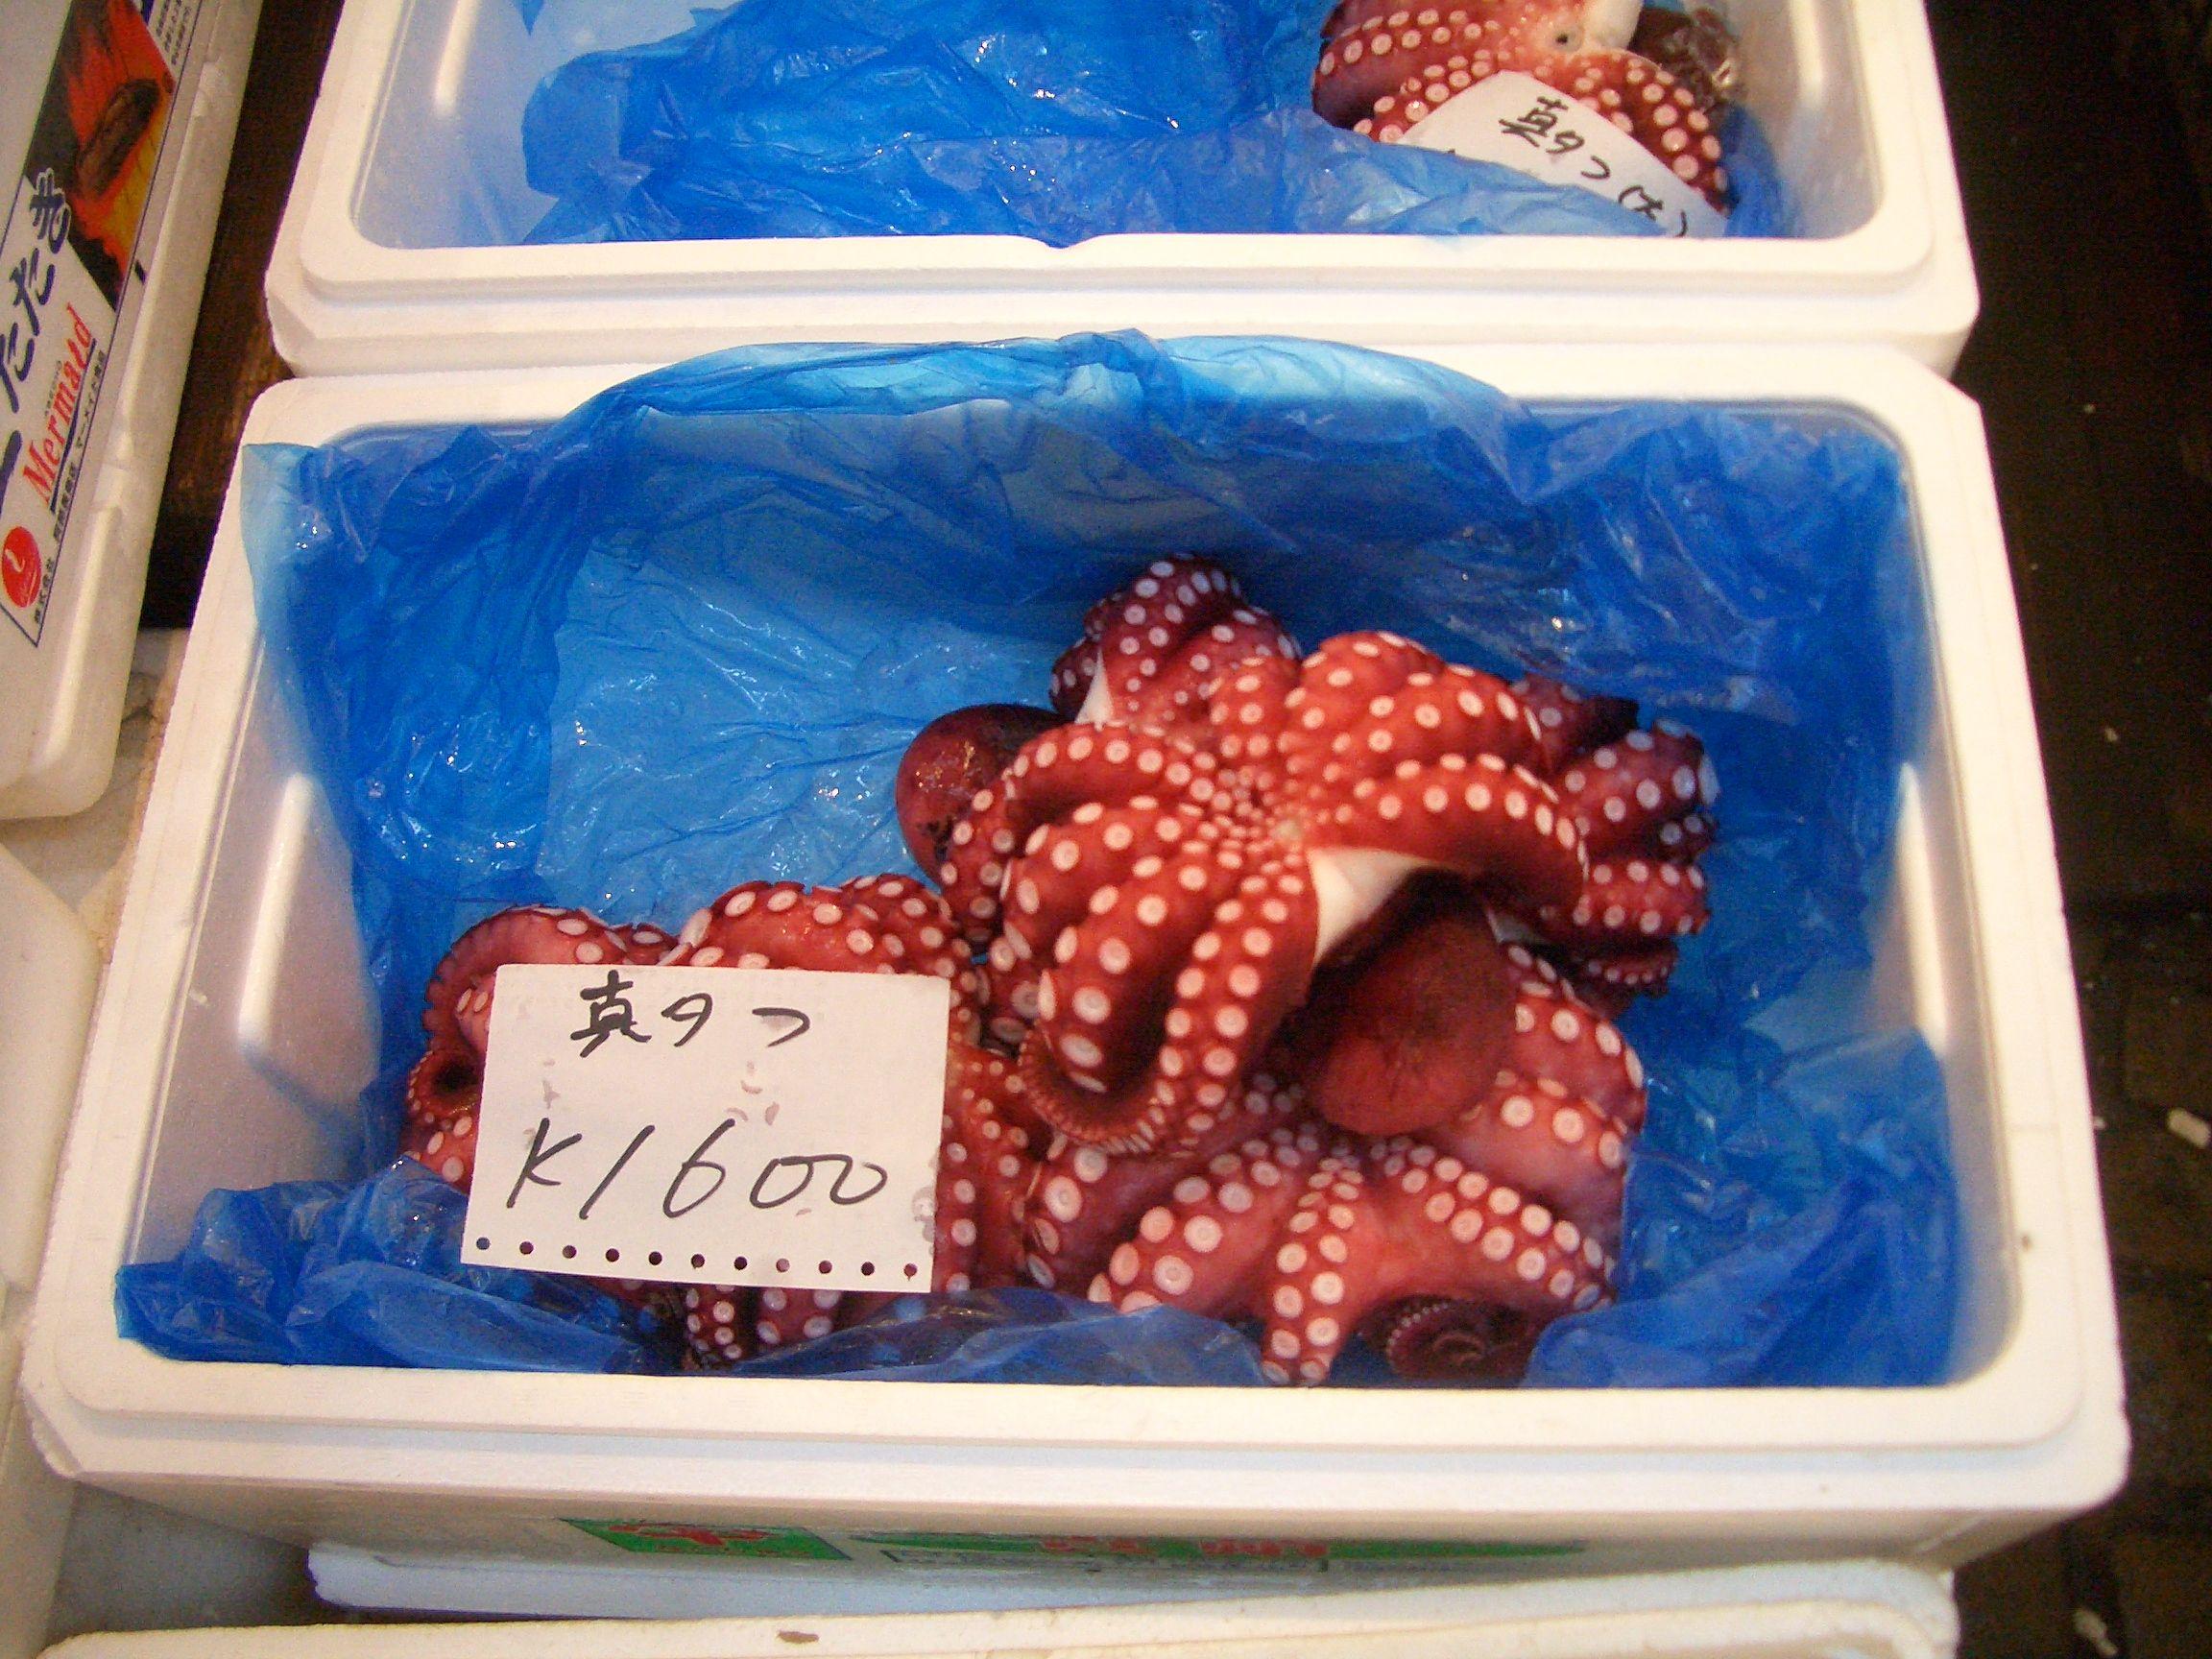 Octopus For Sale Breakfast Food Octopus